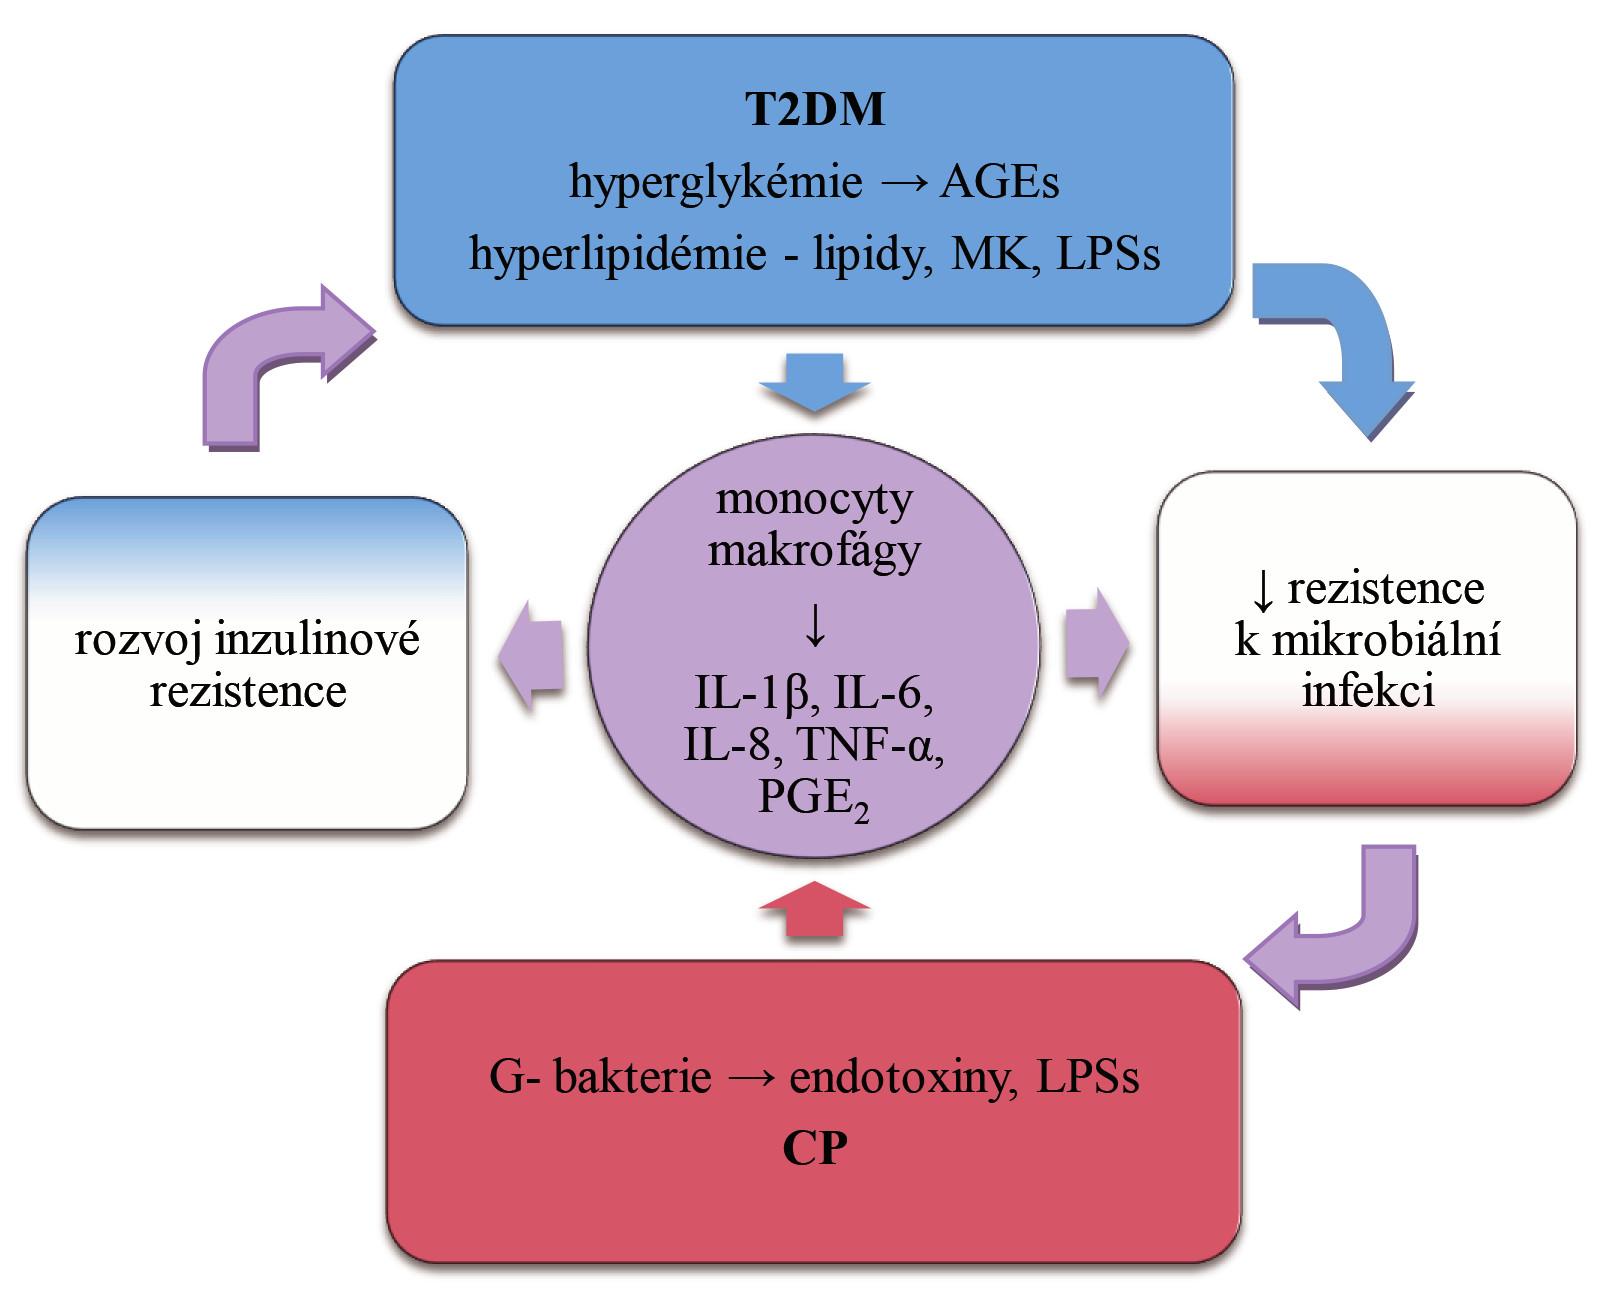 Význam cytokinů v obousměrném vztahu chronické parodontitidy (CP) a diabetes mellitus 2. typu (T2DM), upraveno podle [26, 31].